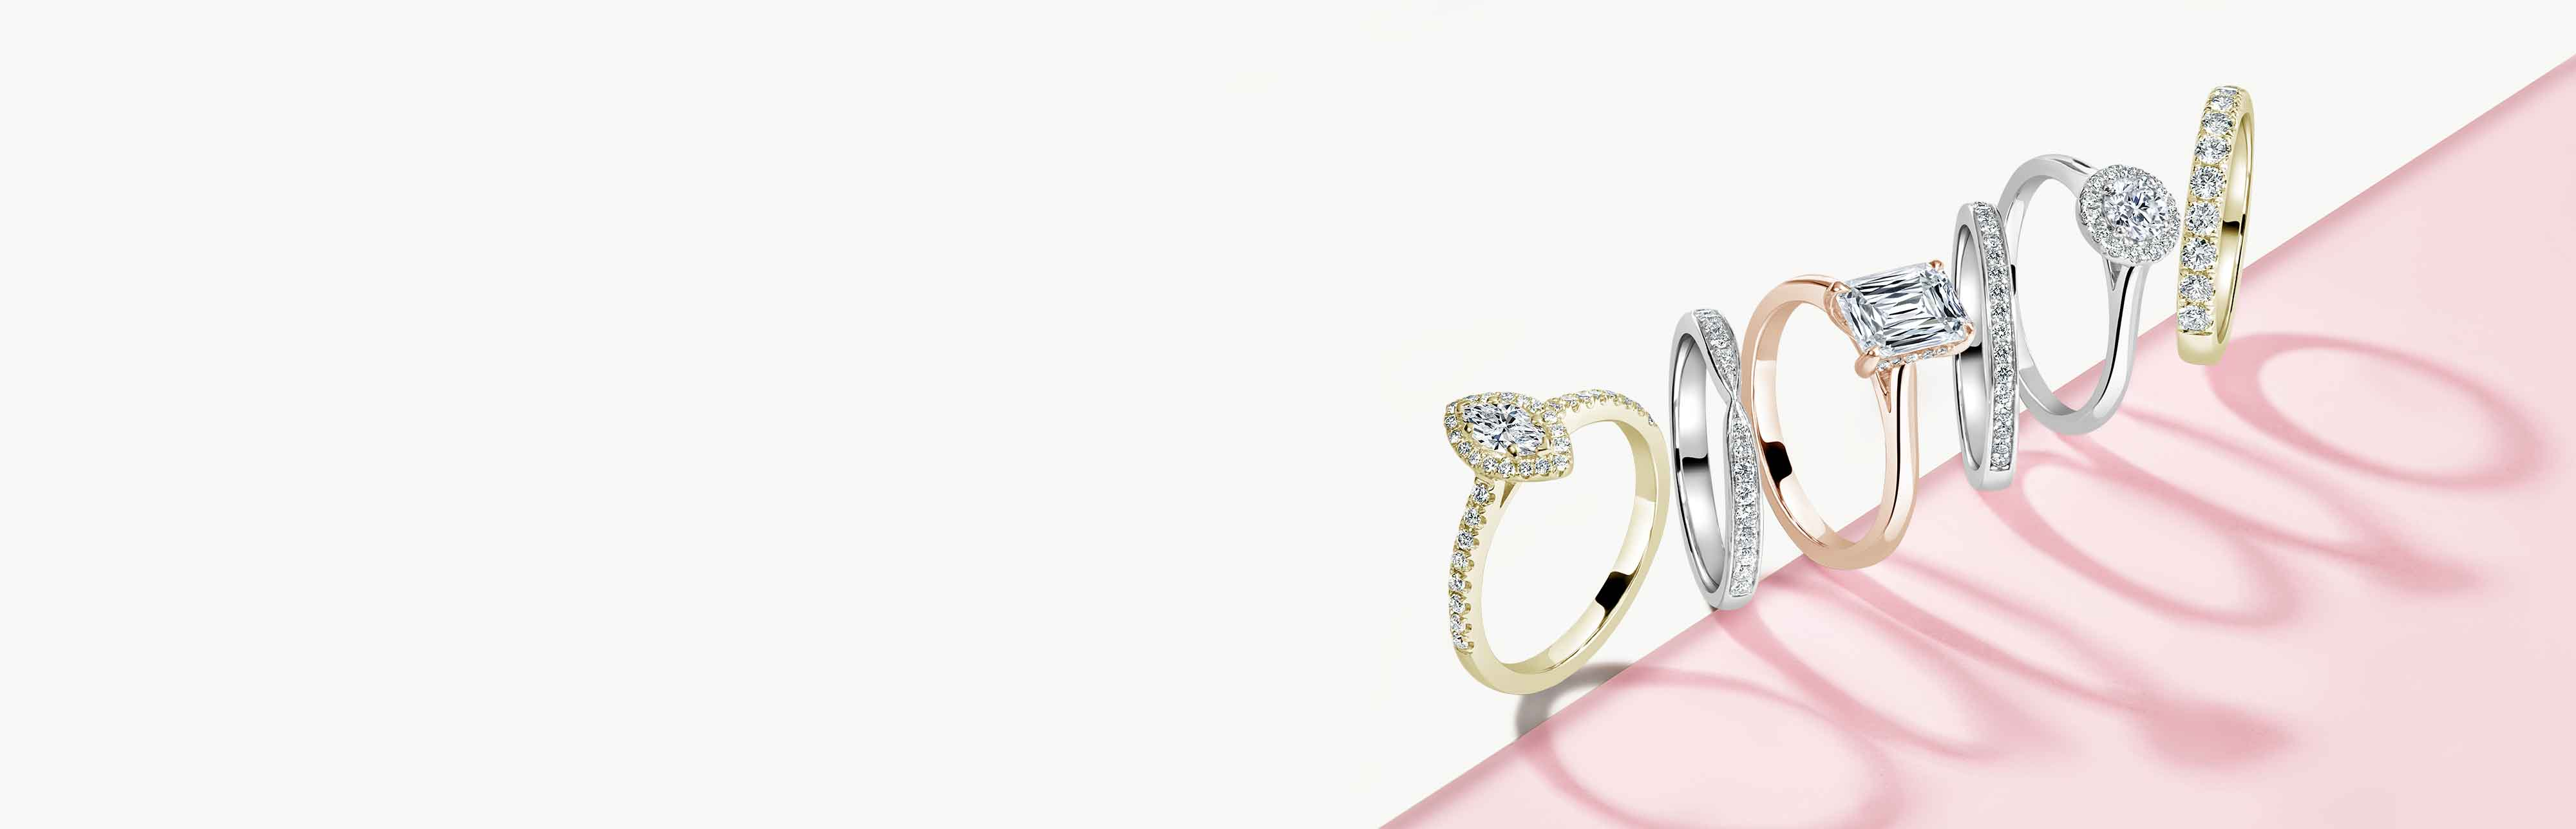 White Gold Princess Cut Engagement Rings - Steven Stone